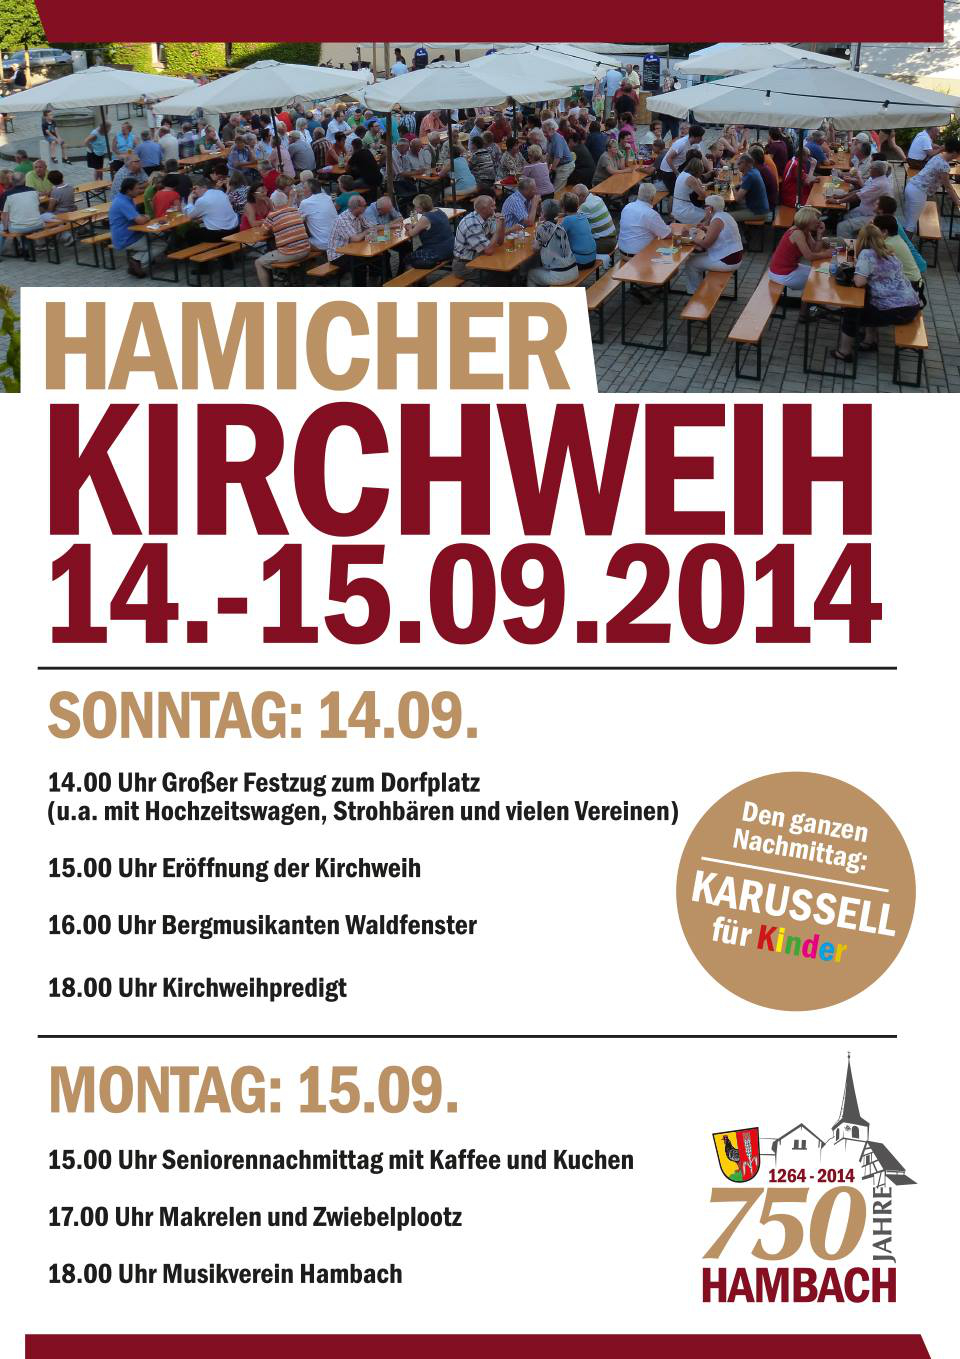 KirchweihPlakat2014richtig